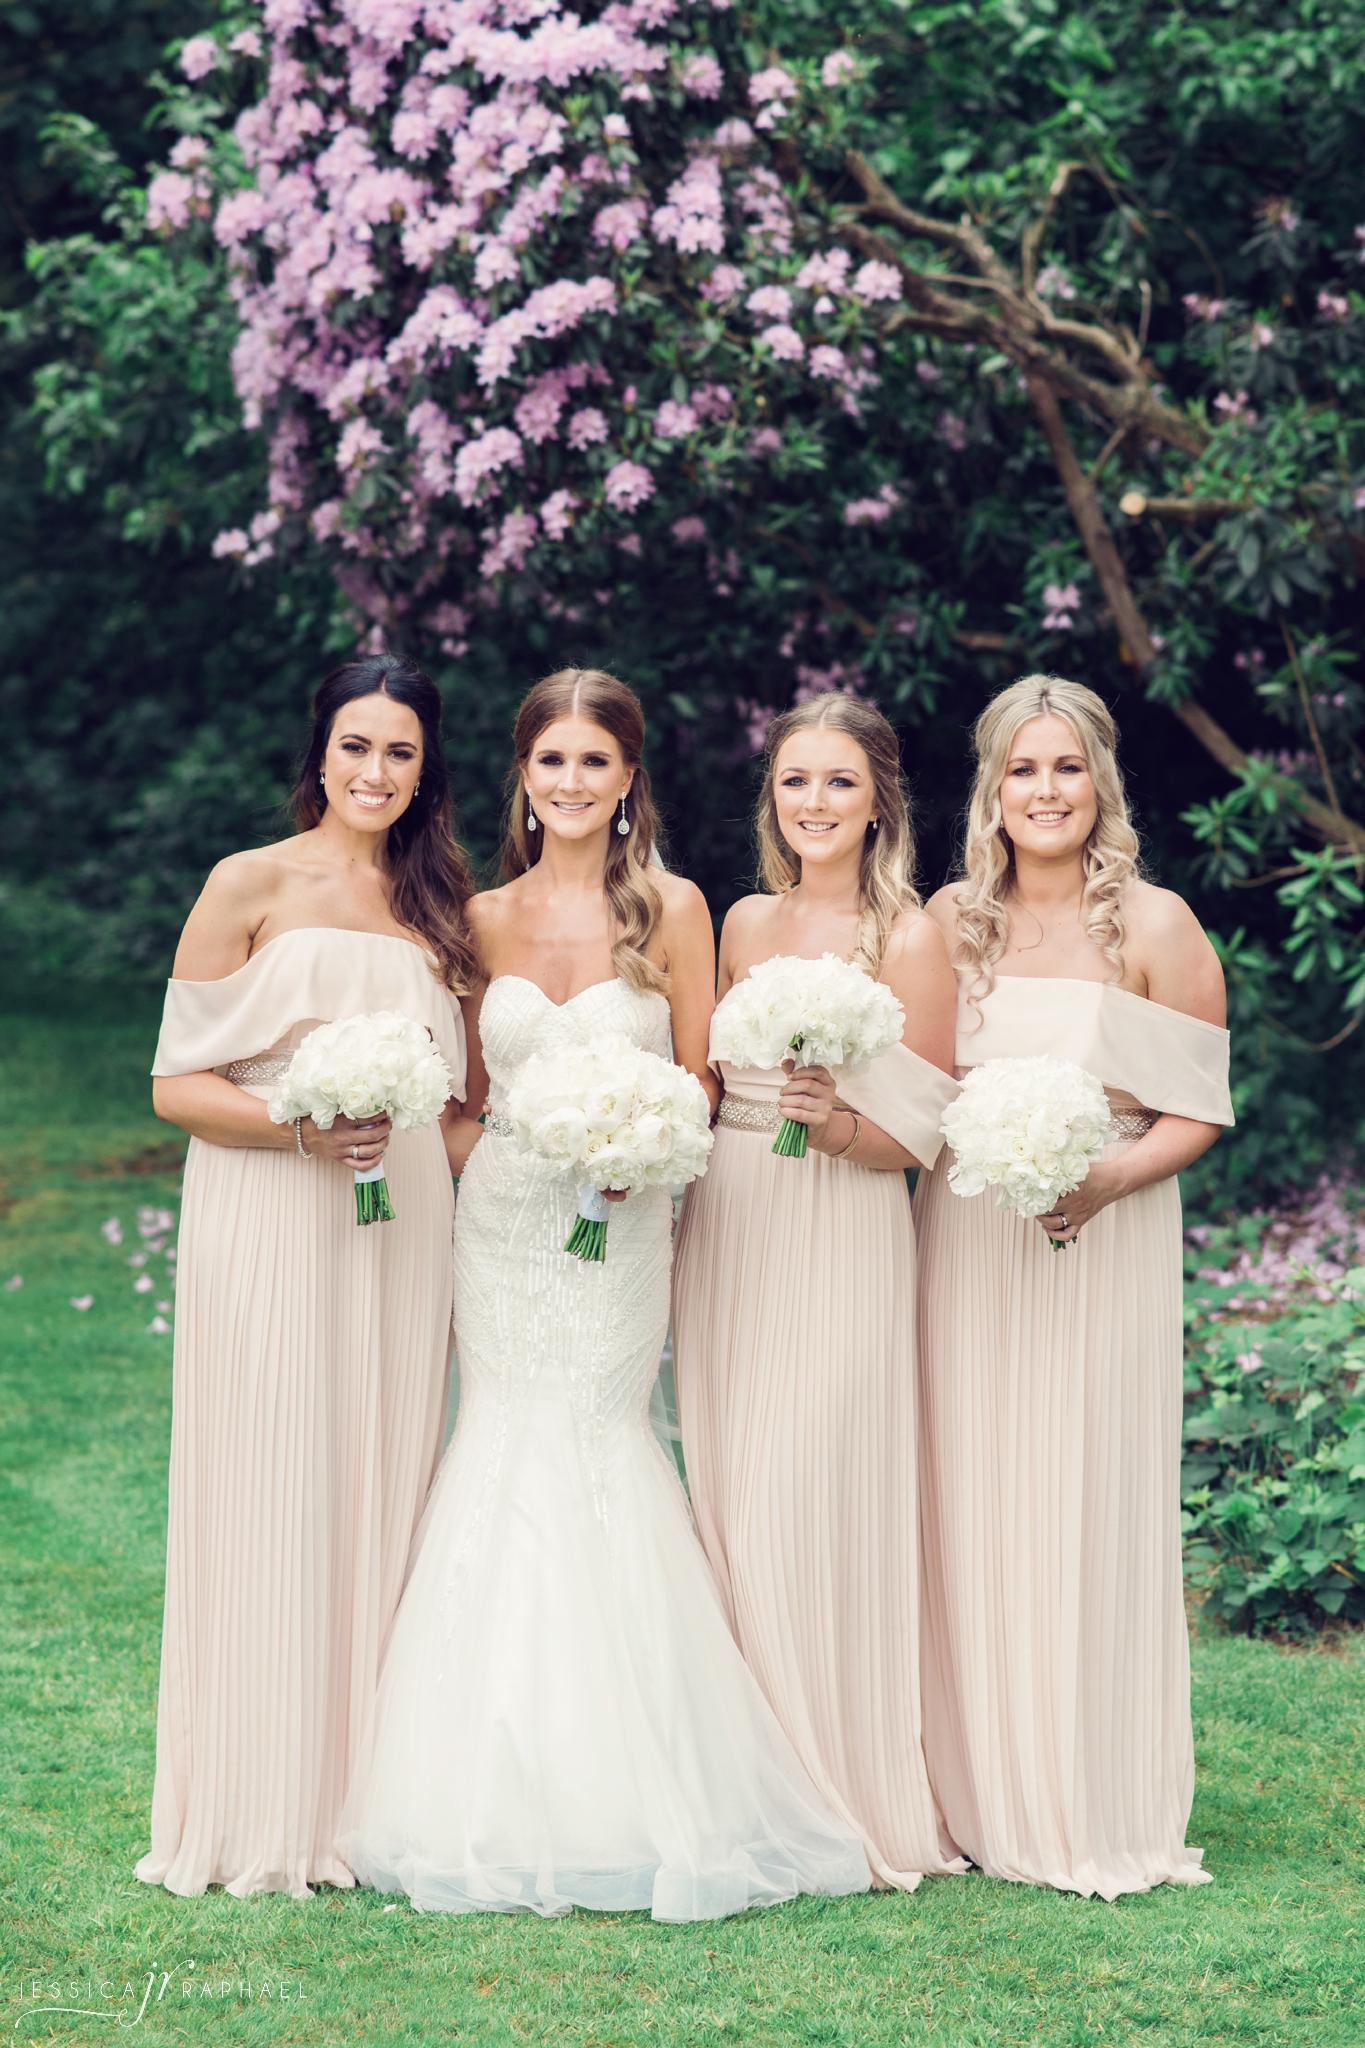 iscoyd-park-weddings-iscoyd-park-wedding-photographers-luxury-wedding-photographer-jessica-raphael-photography